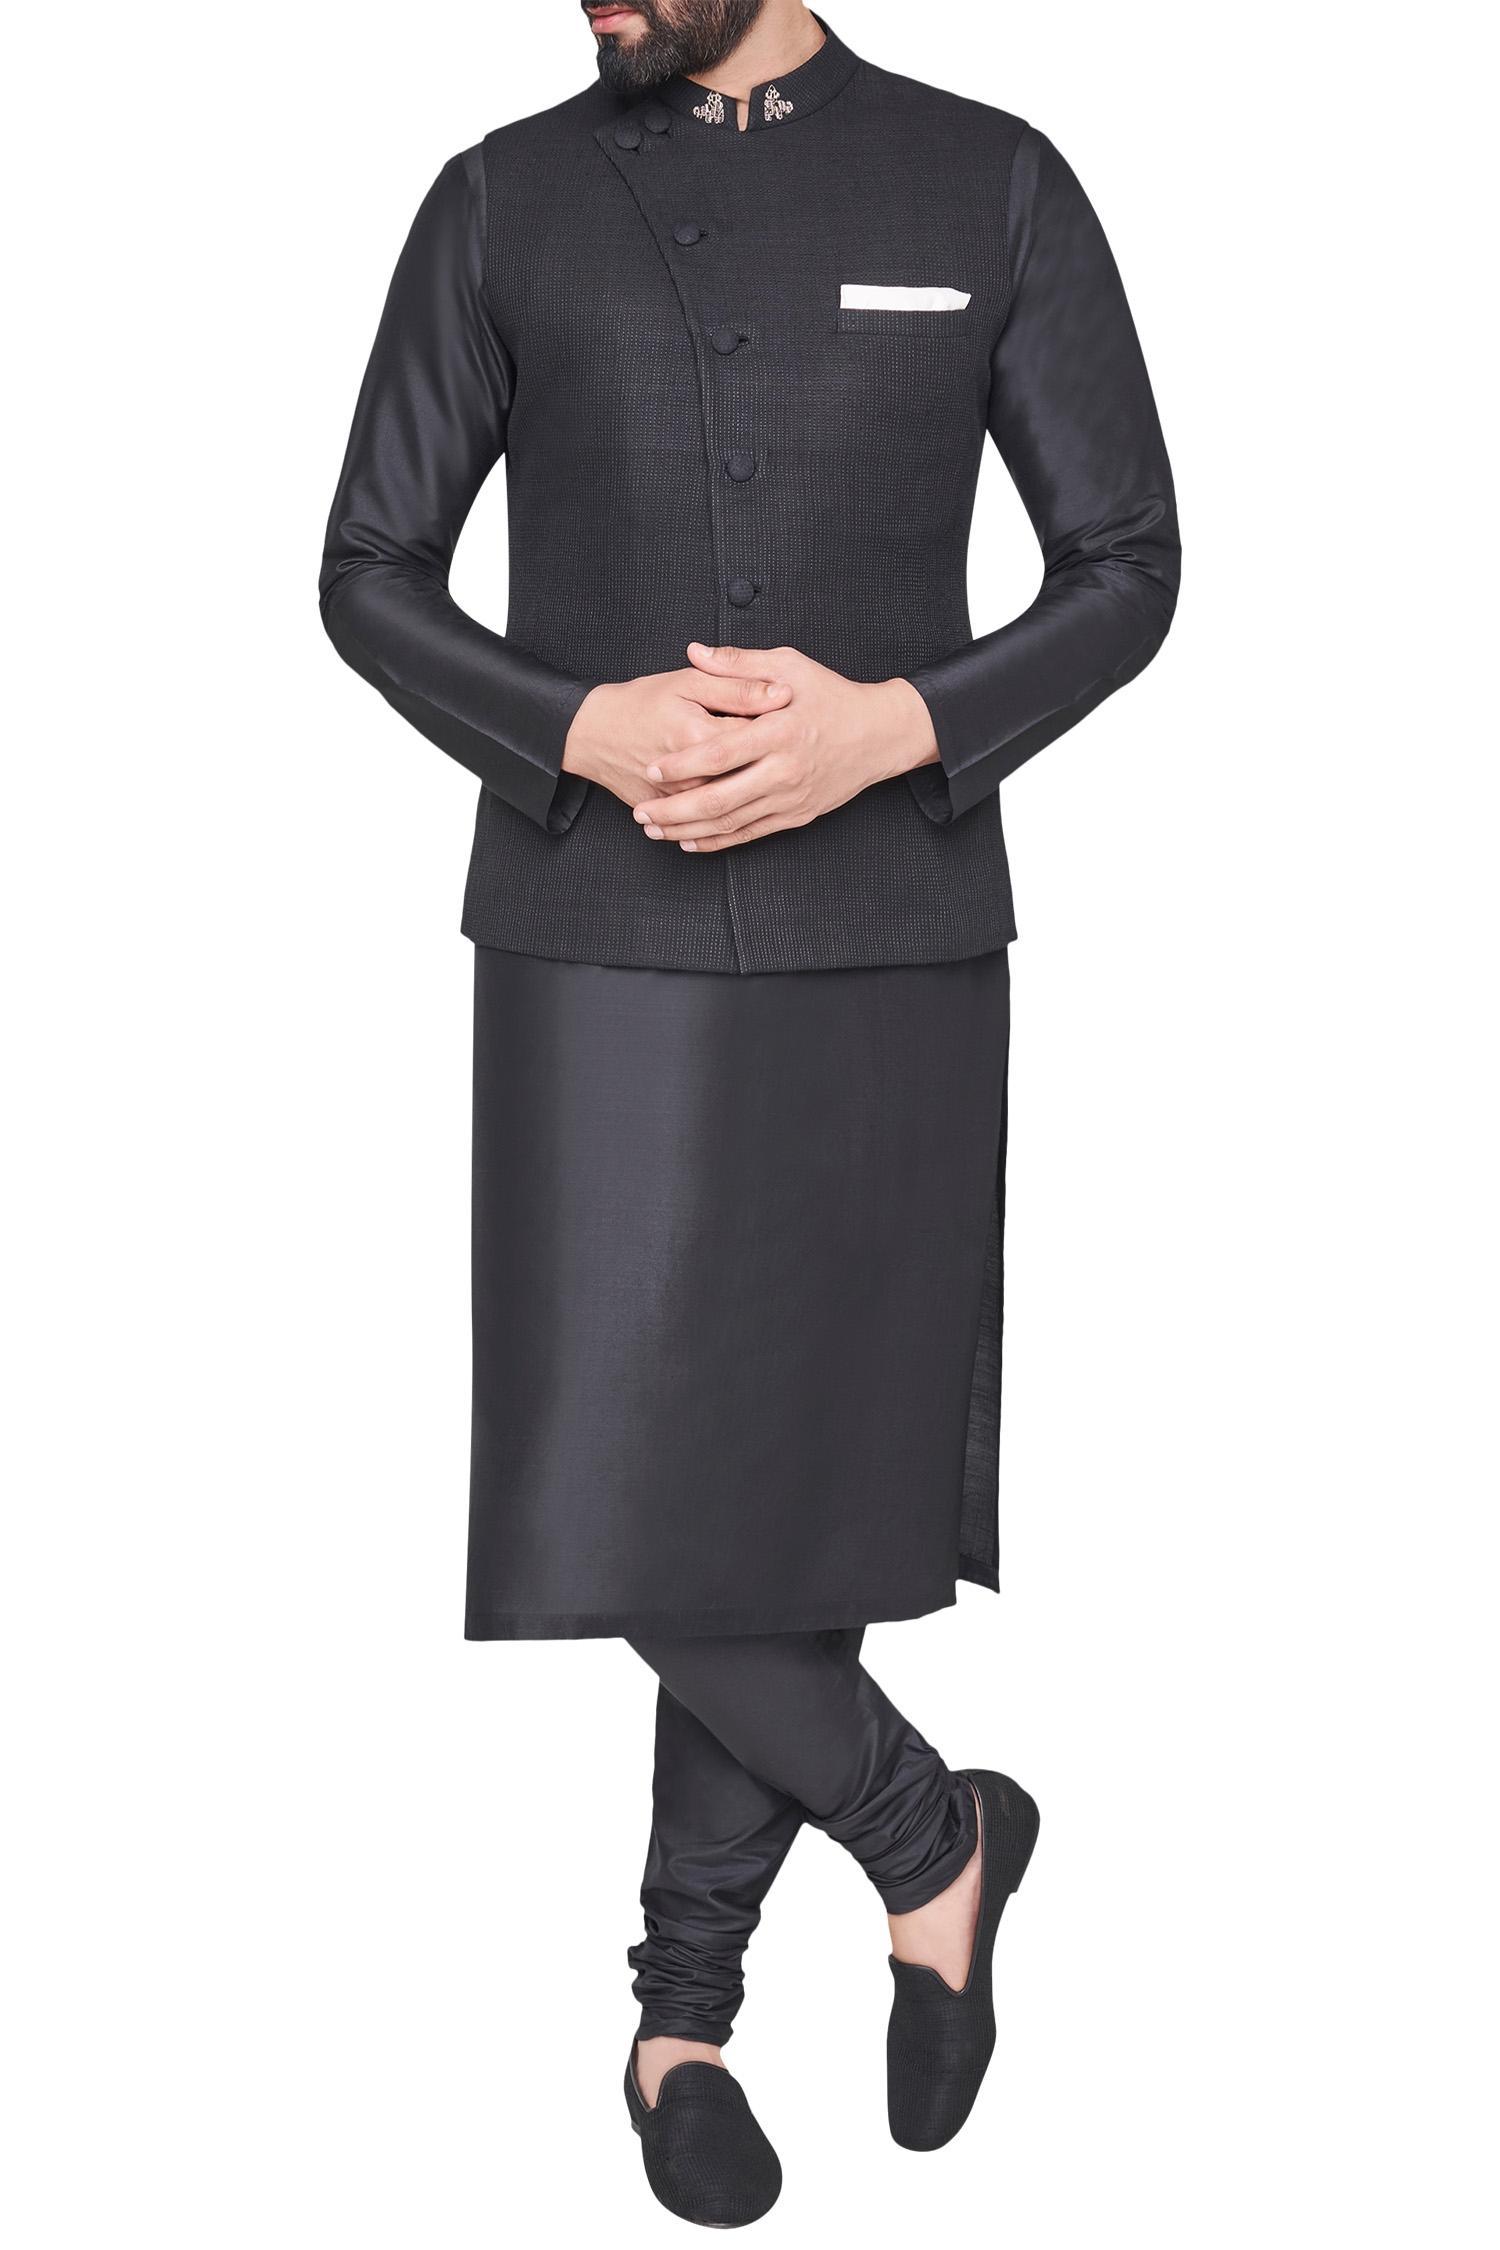 Buy Amay Bundi by Anita Dongre - Men at Aza Fashions